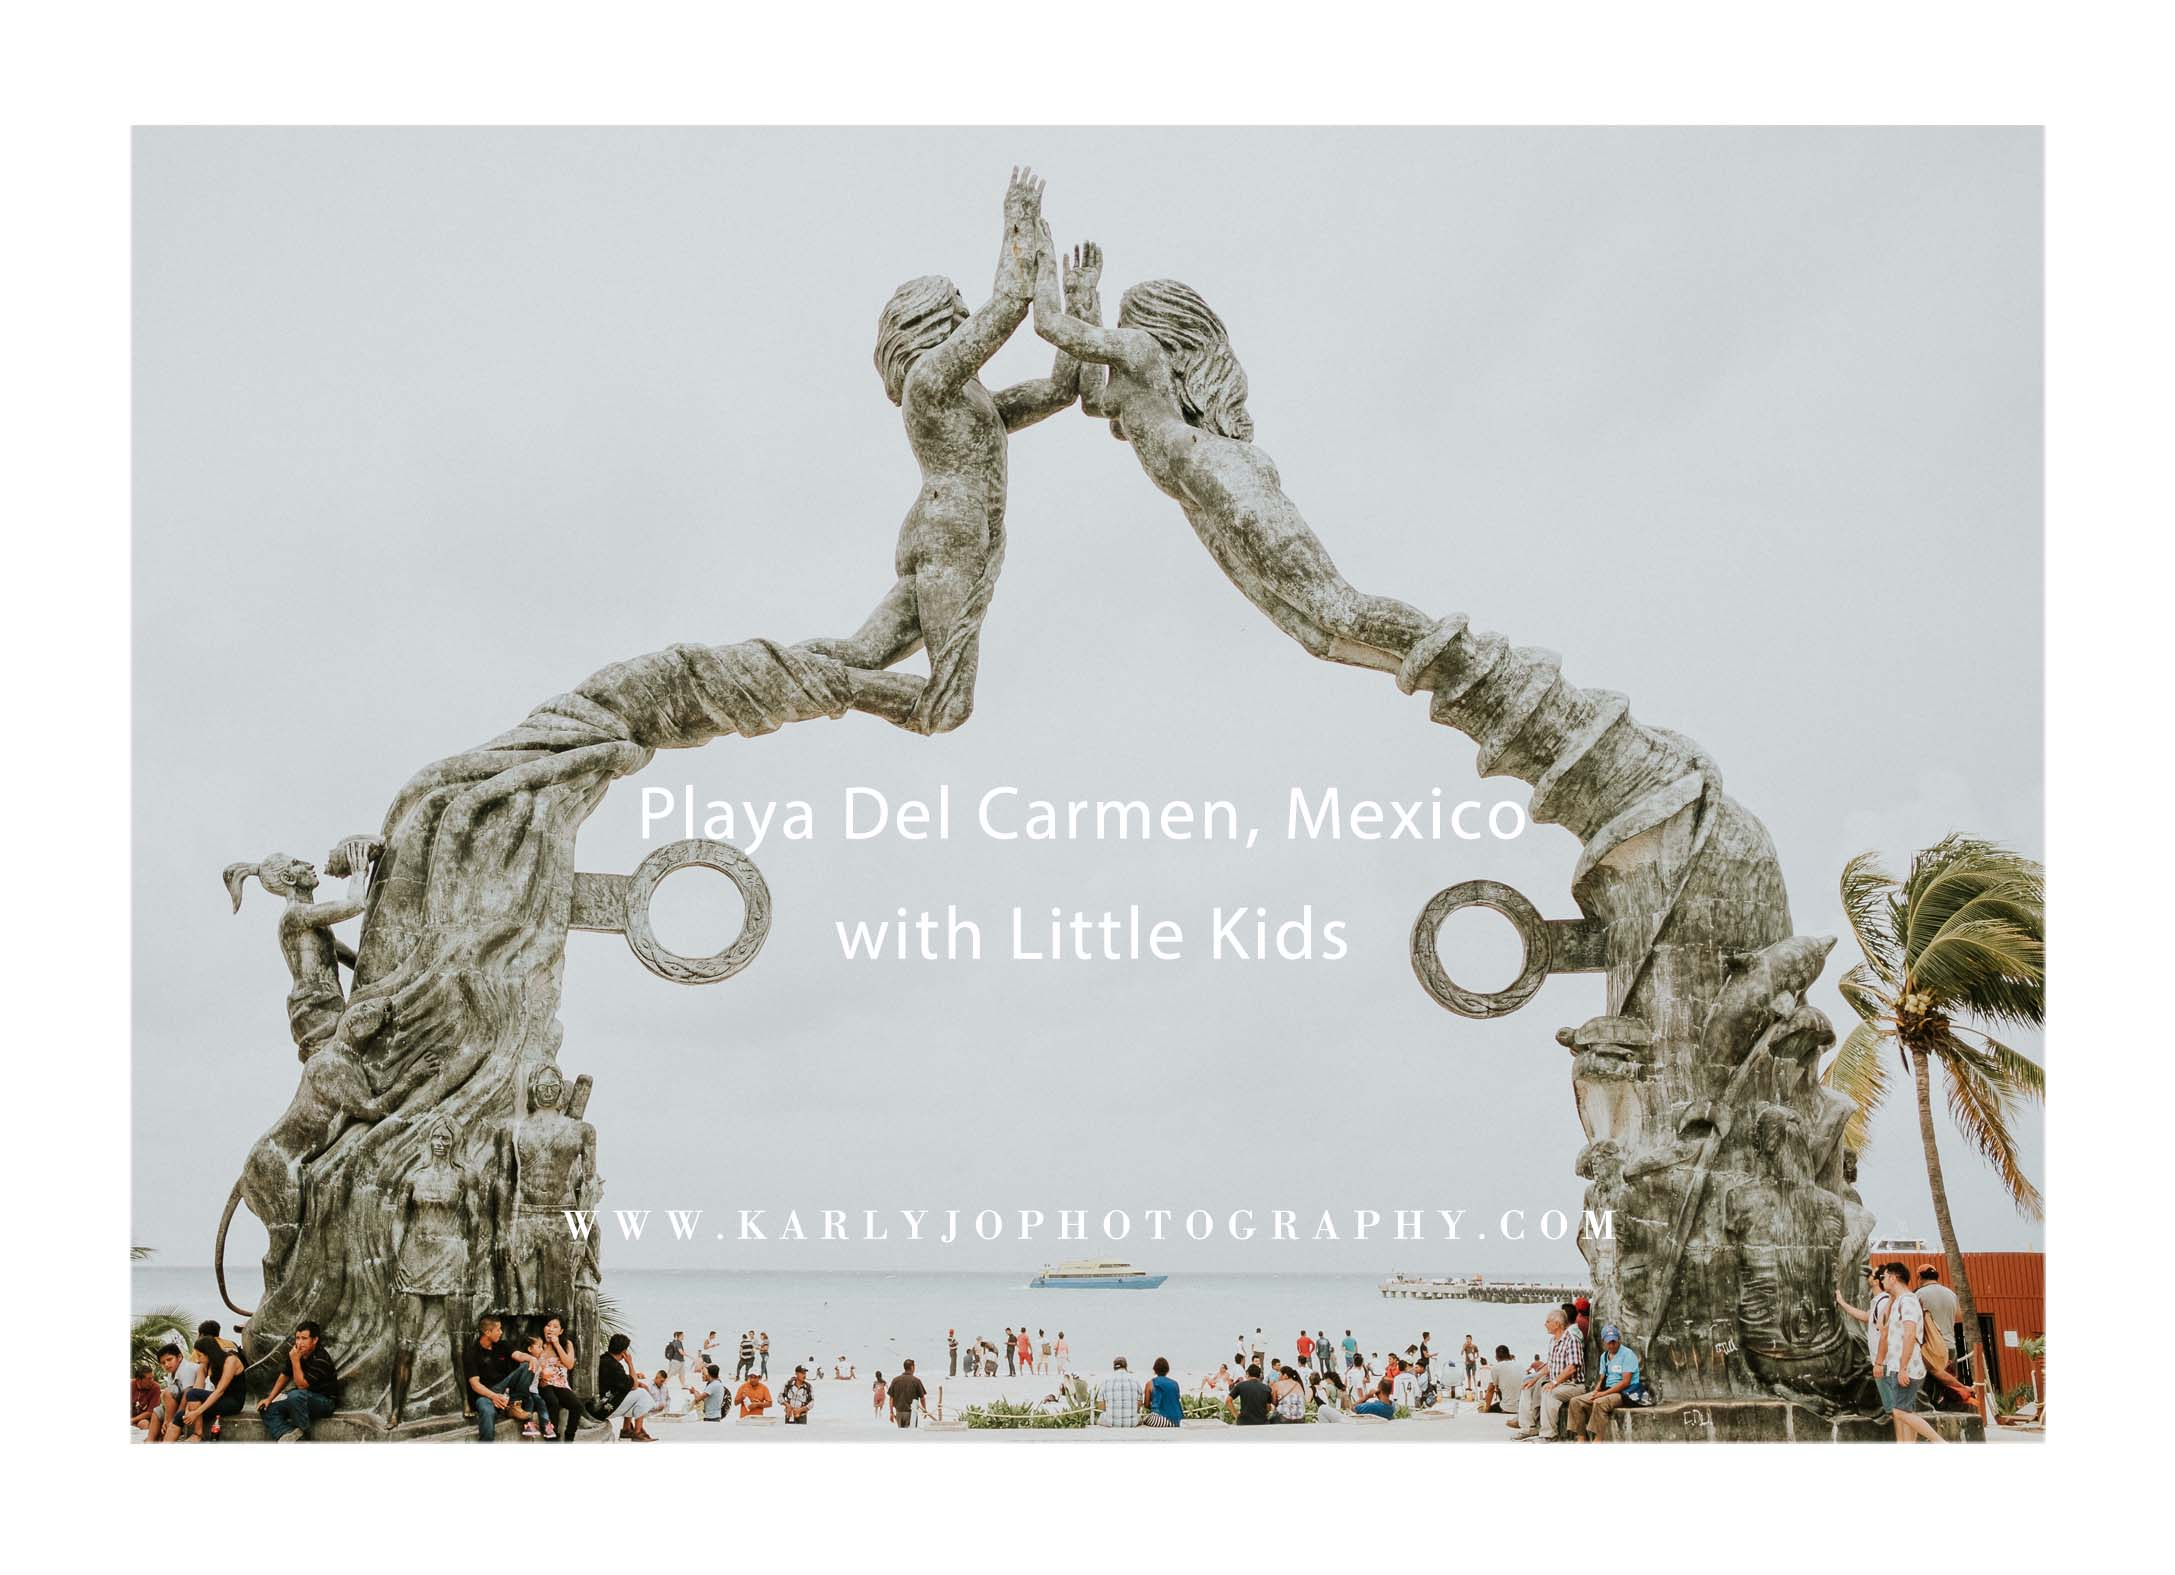 Playa Del Carmen, Mexico with Little Kids